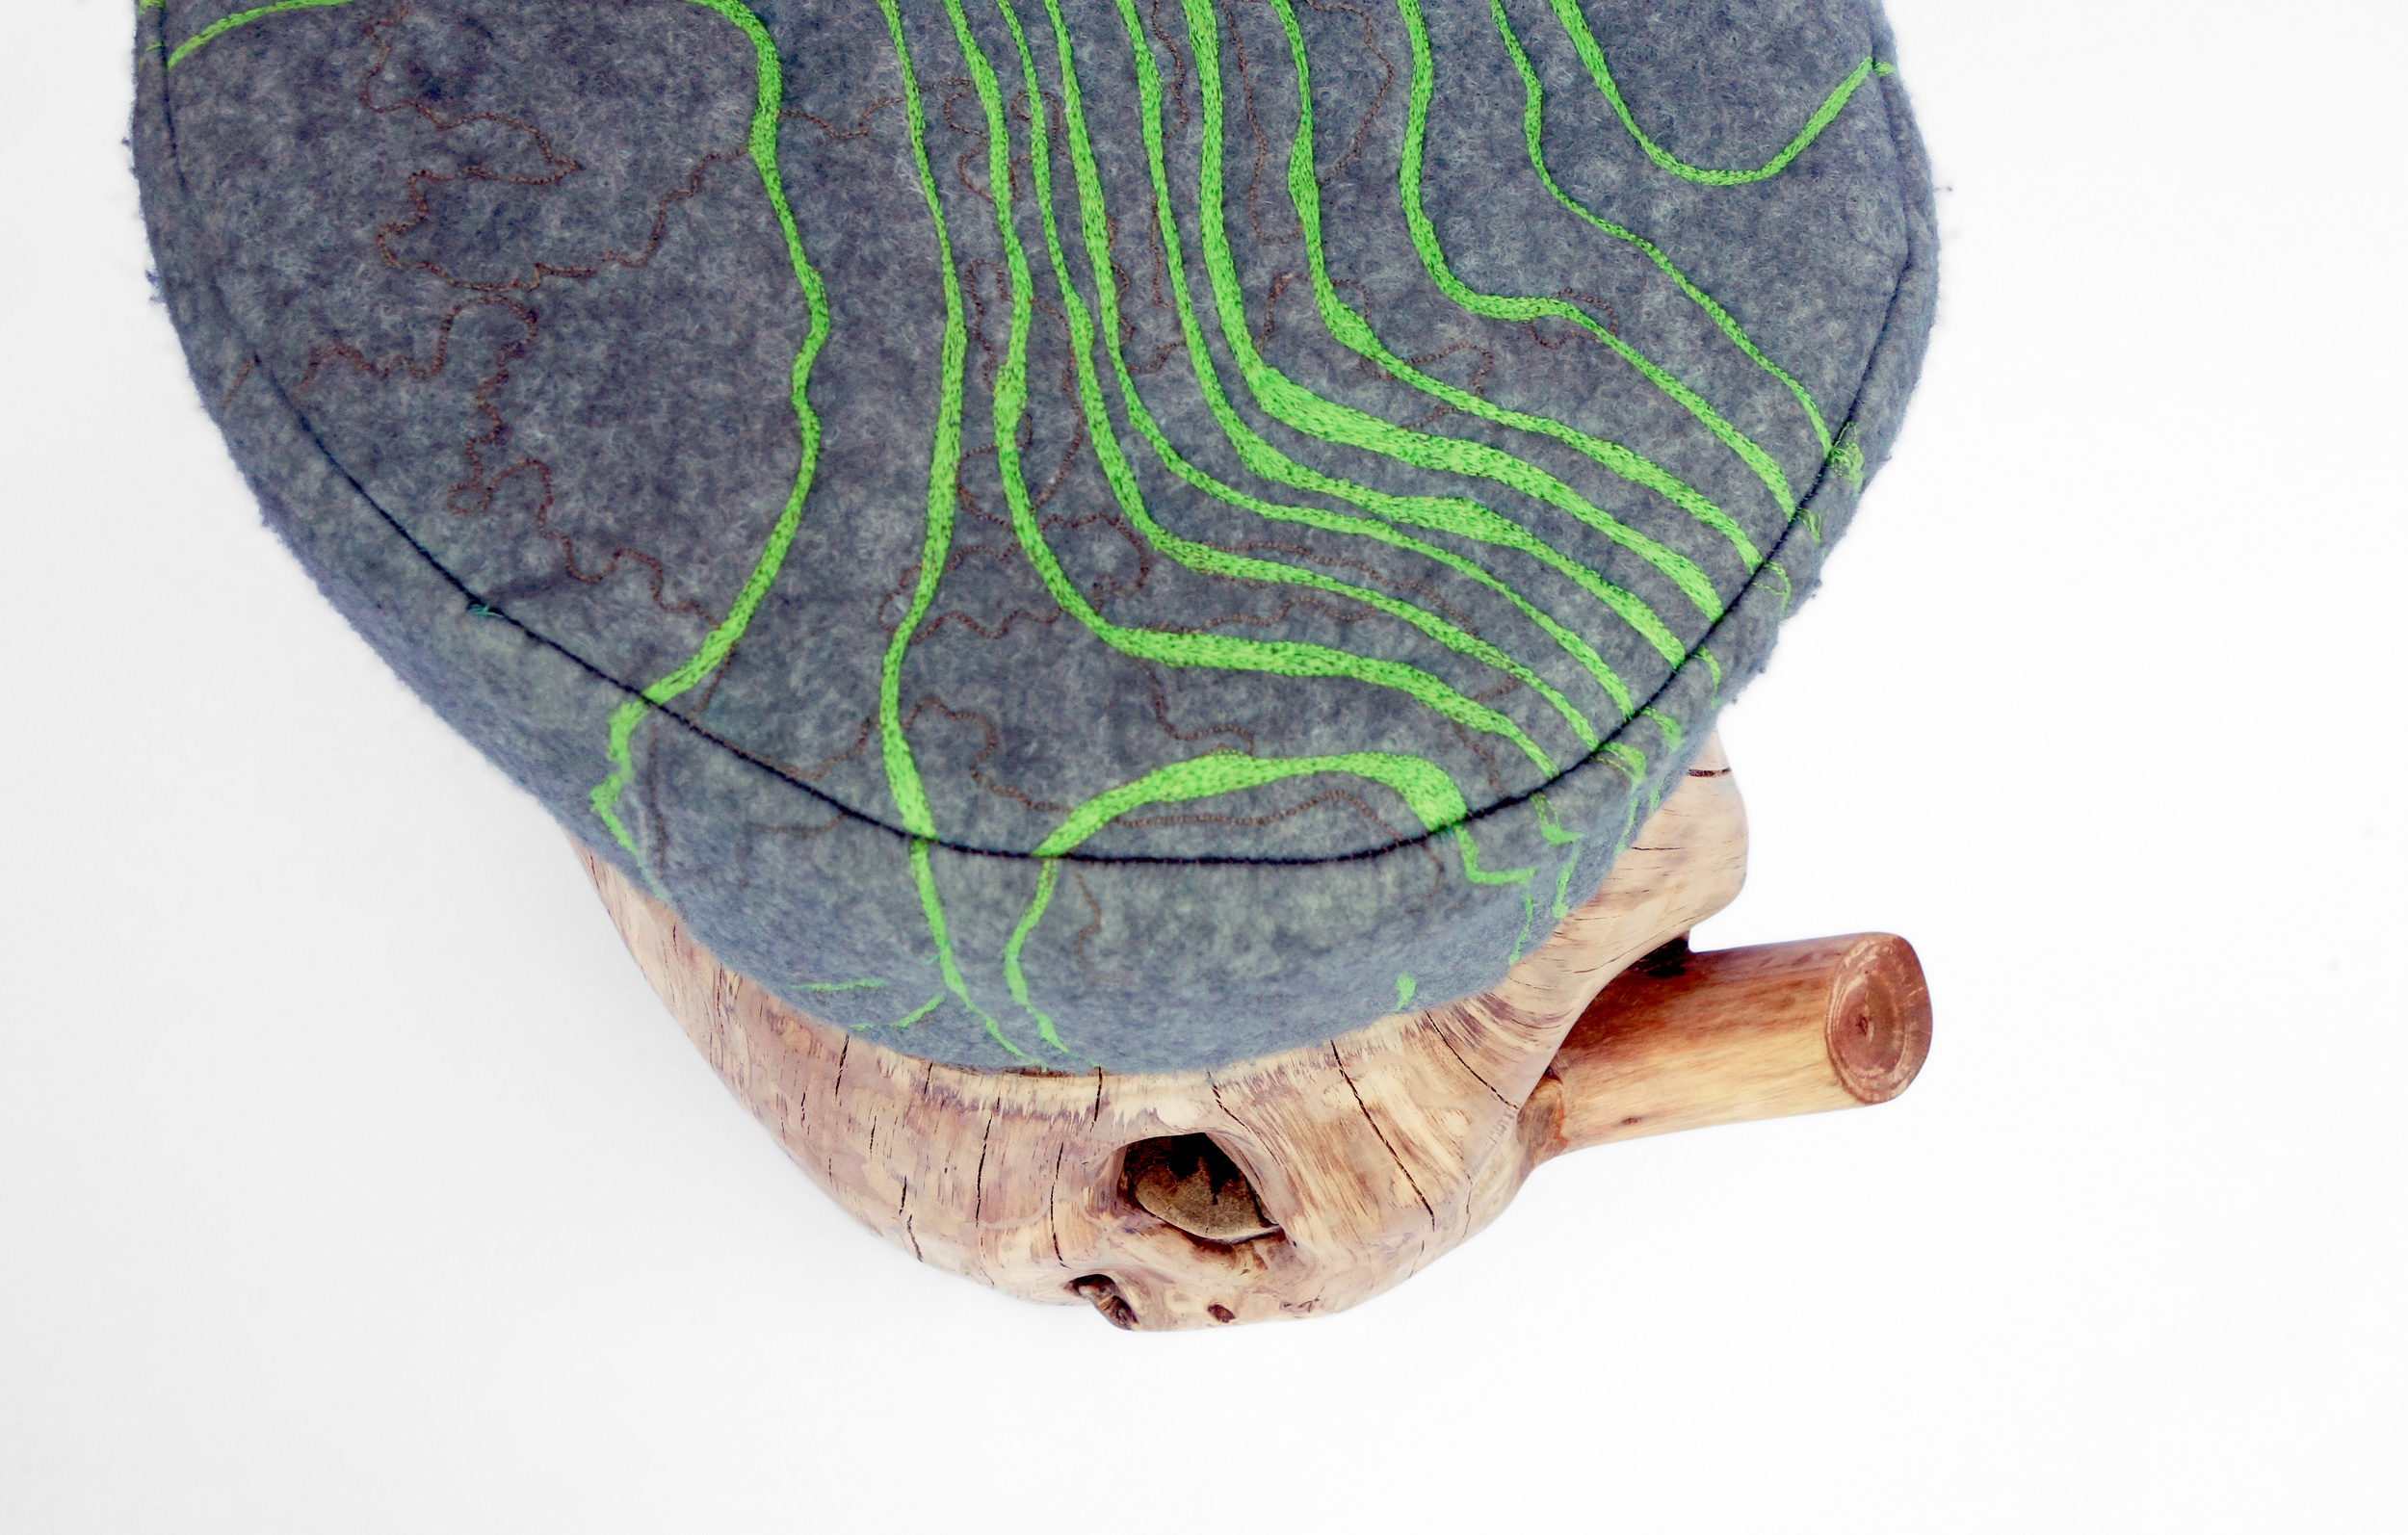 tree stump, felt, thread, industrialized foam    Photographed by: Nicholas Baker